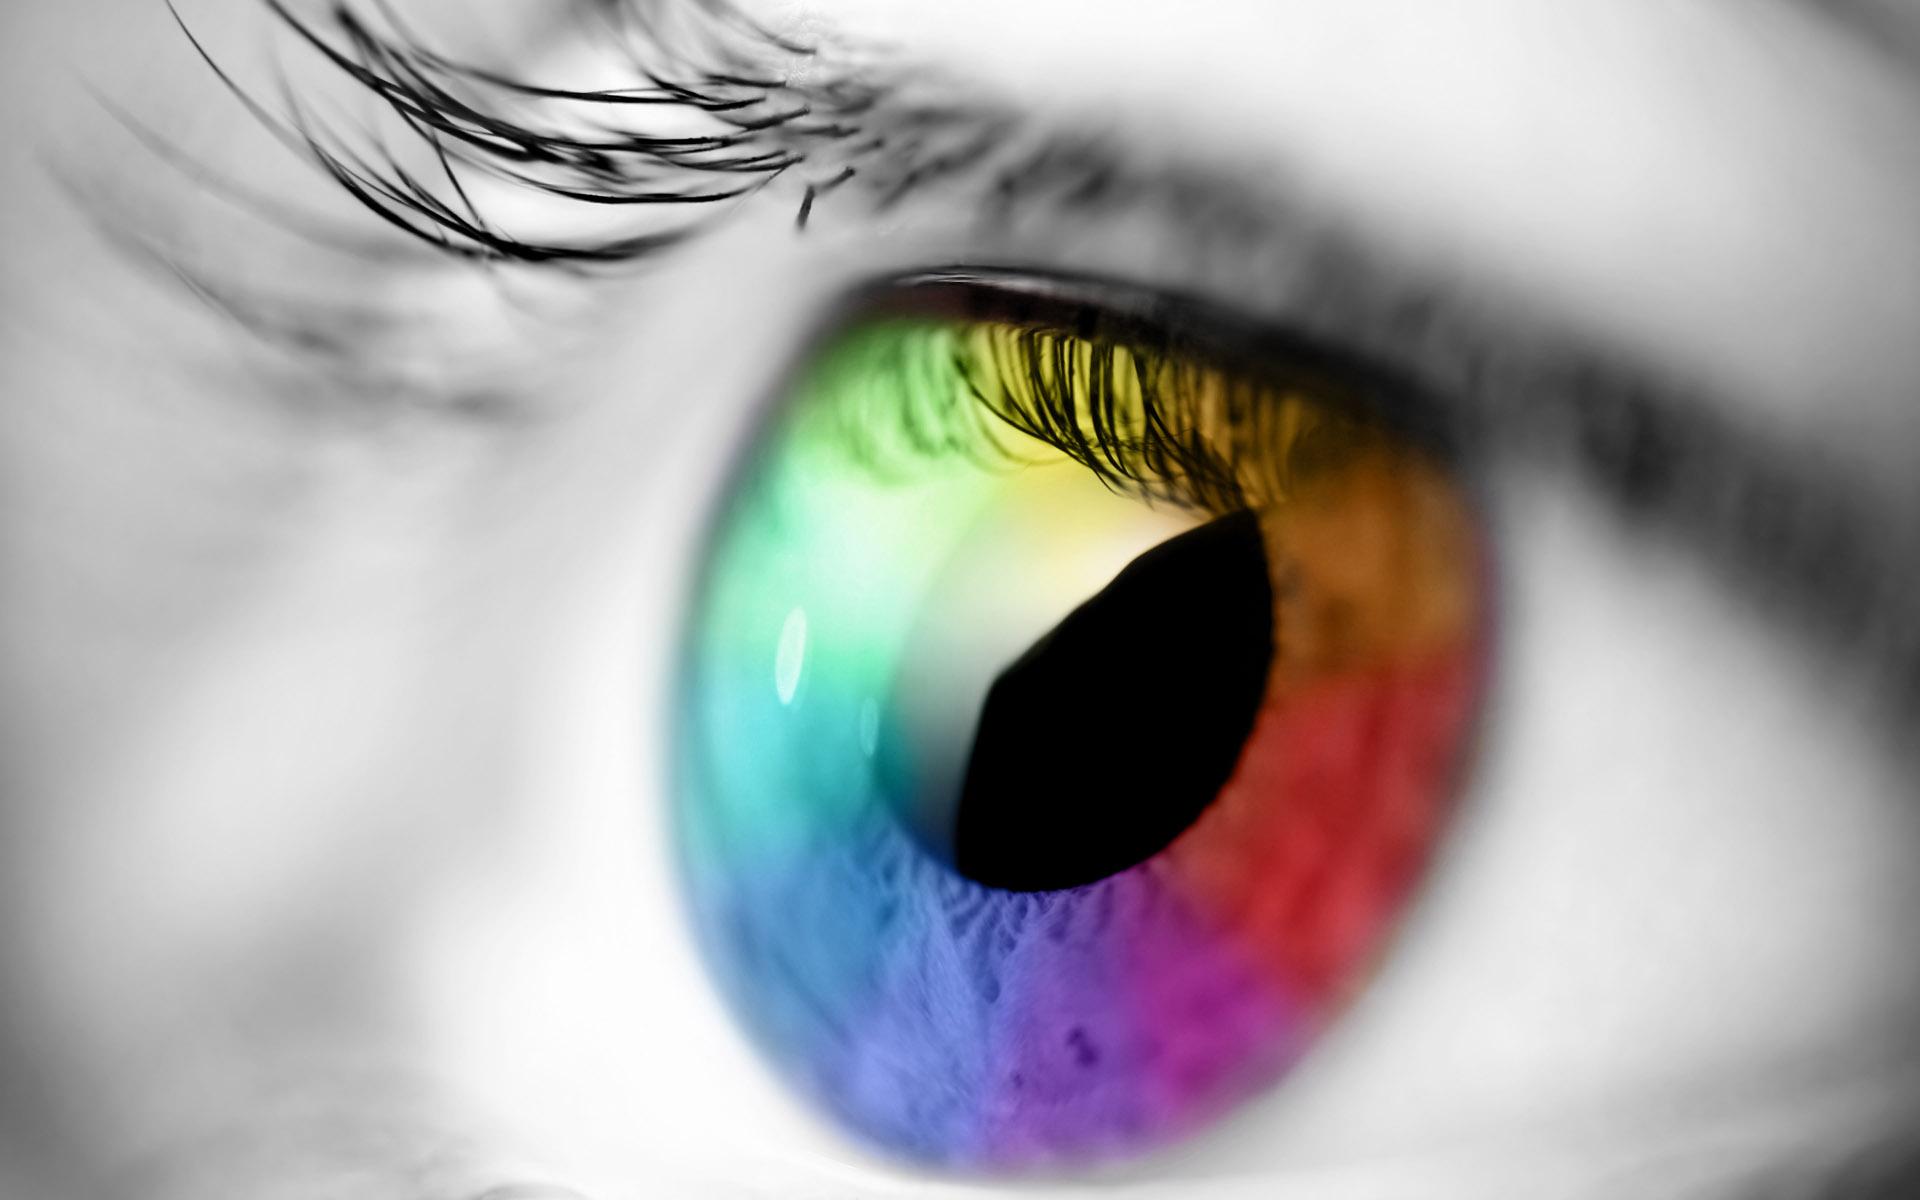 Virtually Appealing Eyes